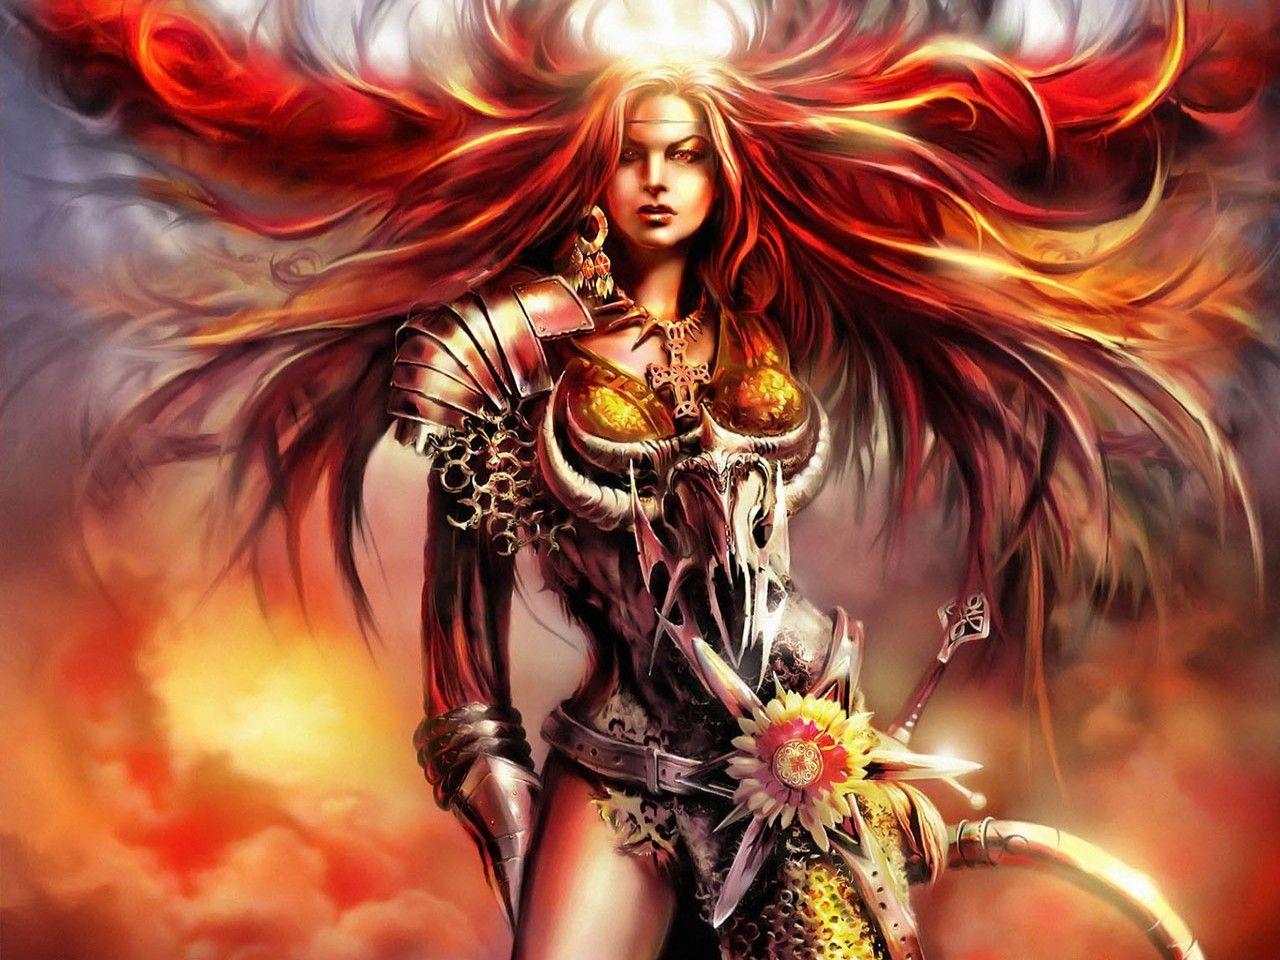 download Bolet Wallpapers fantasy women art wallpapers 1280x960